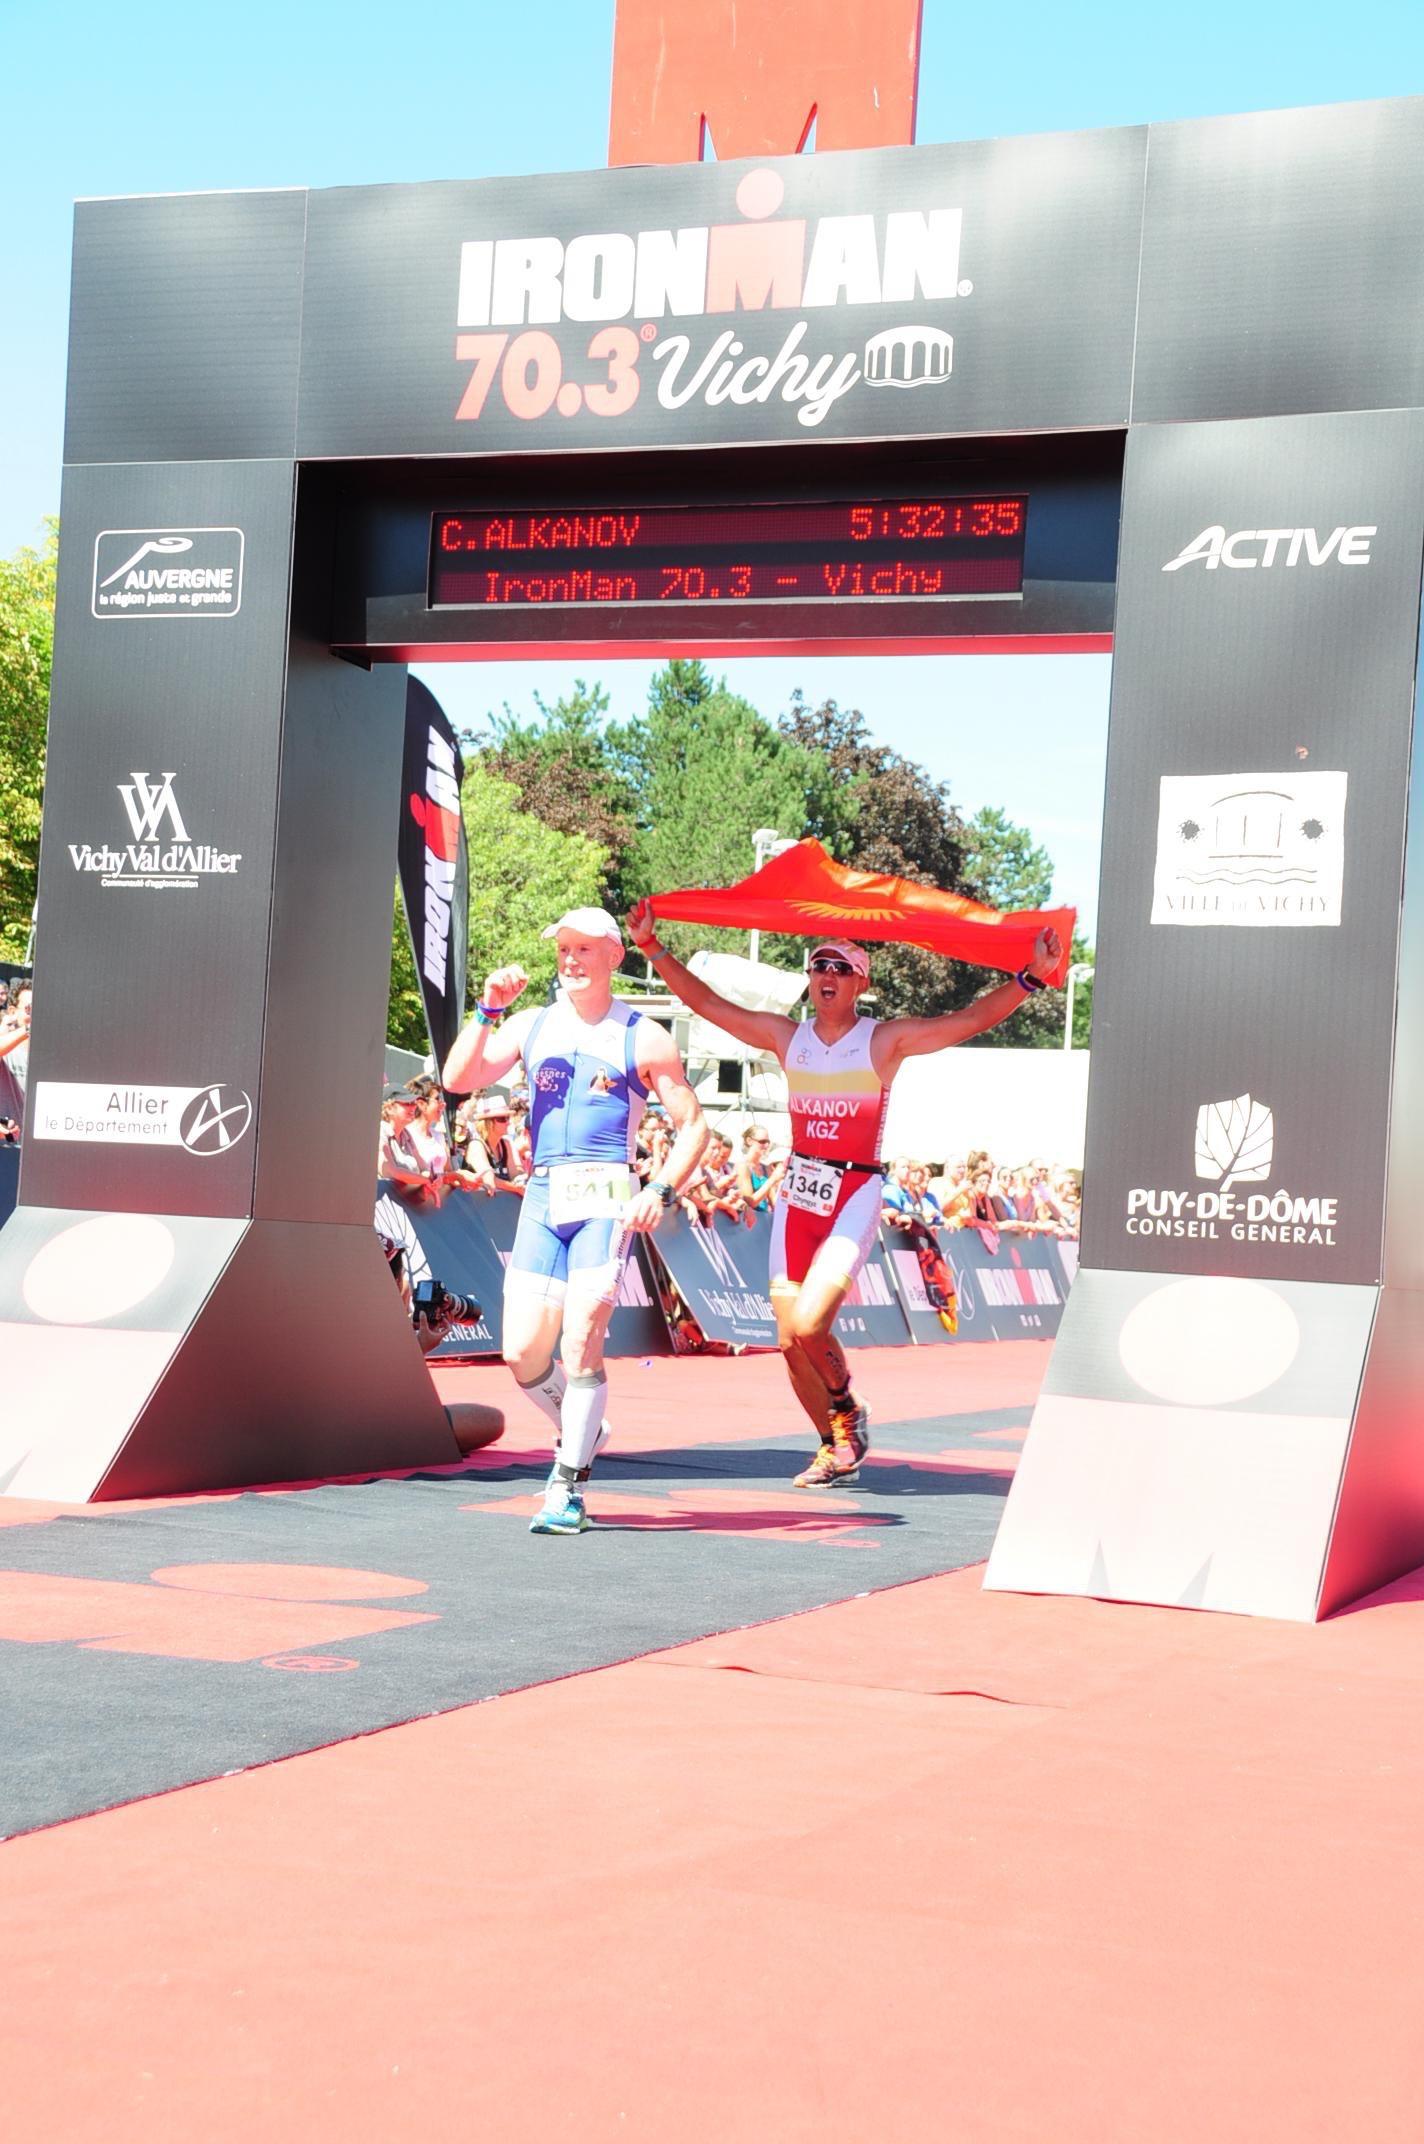 Финиш на Ironman 70.3 Vichy